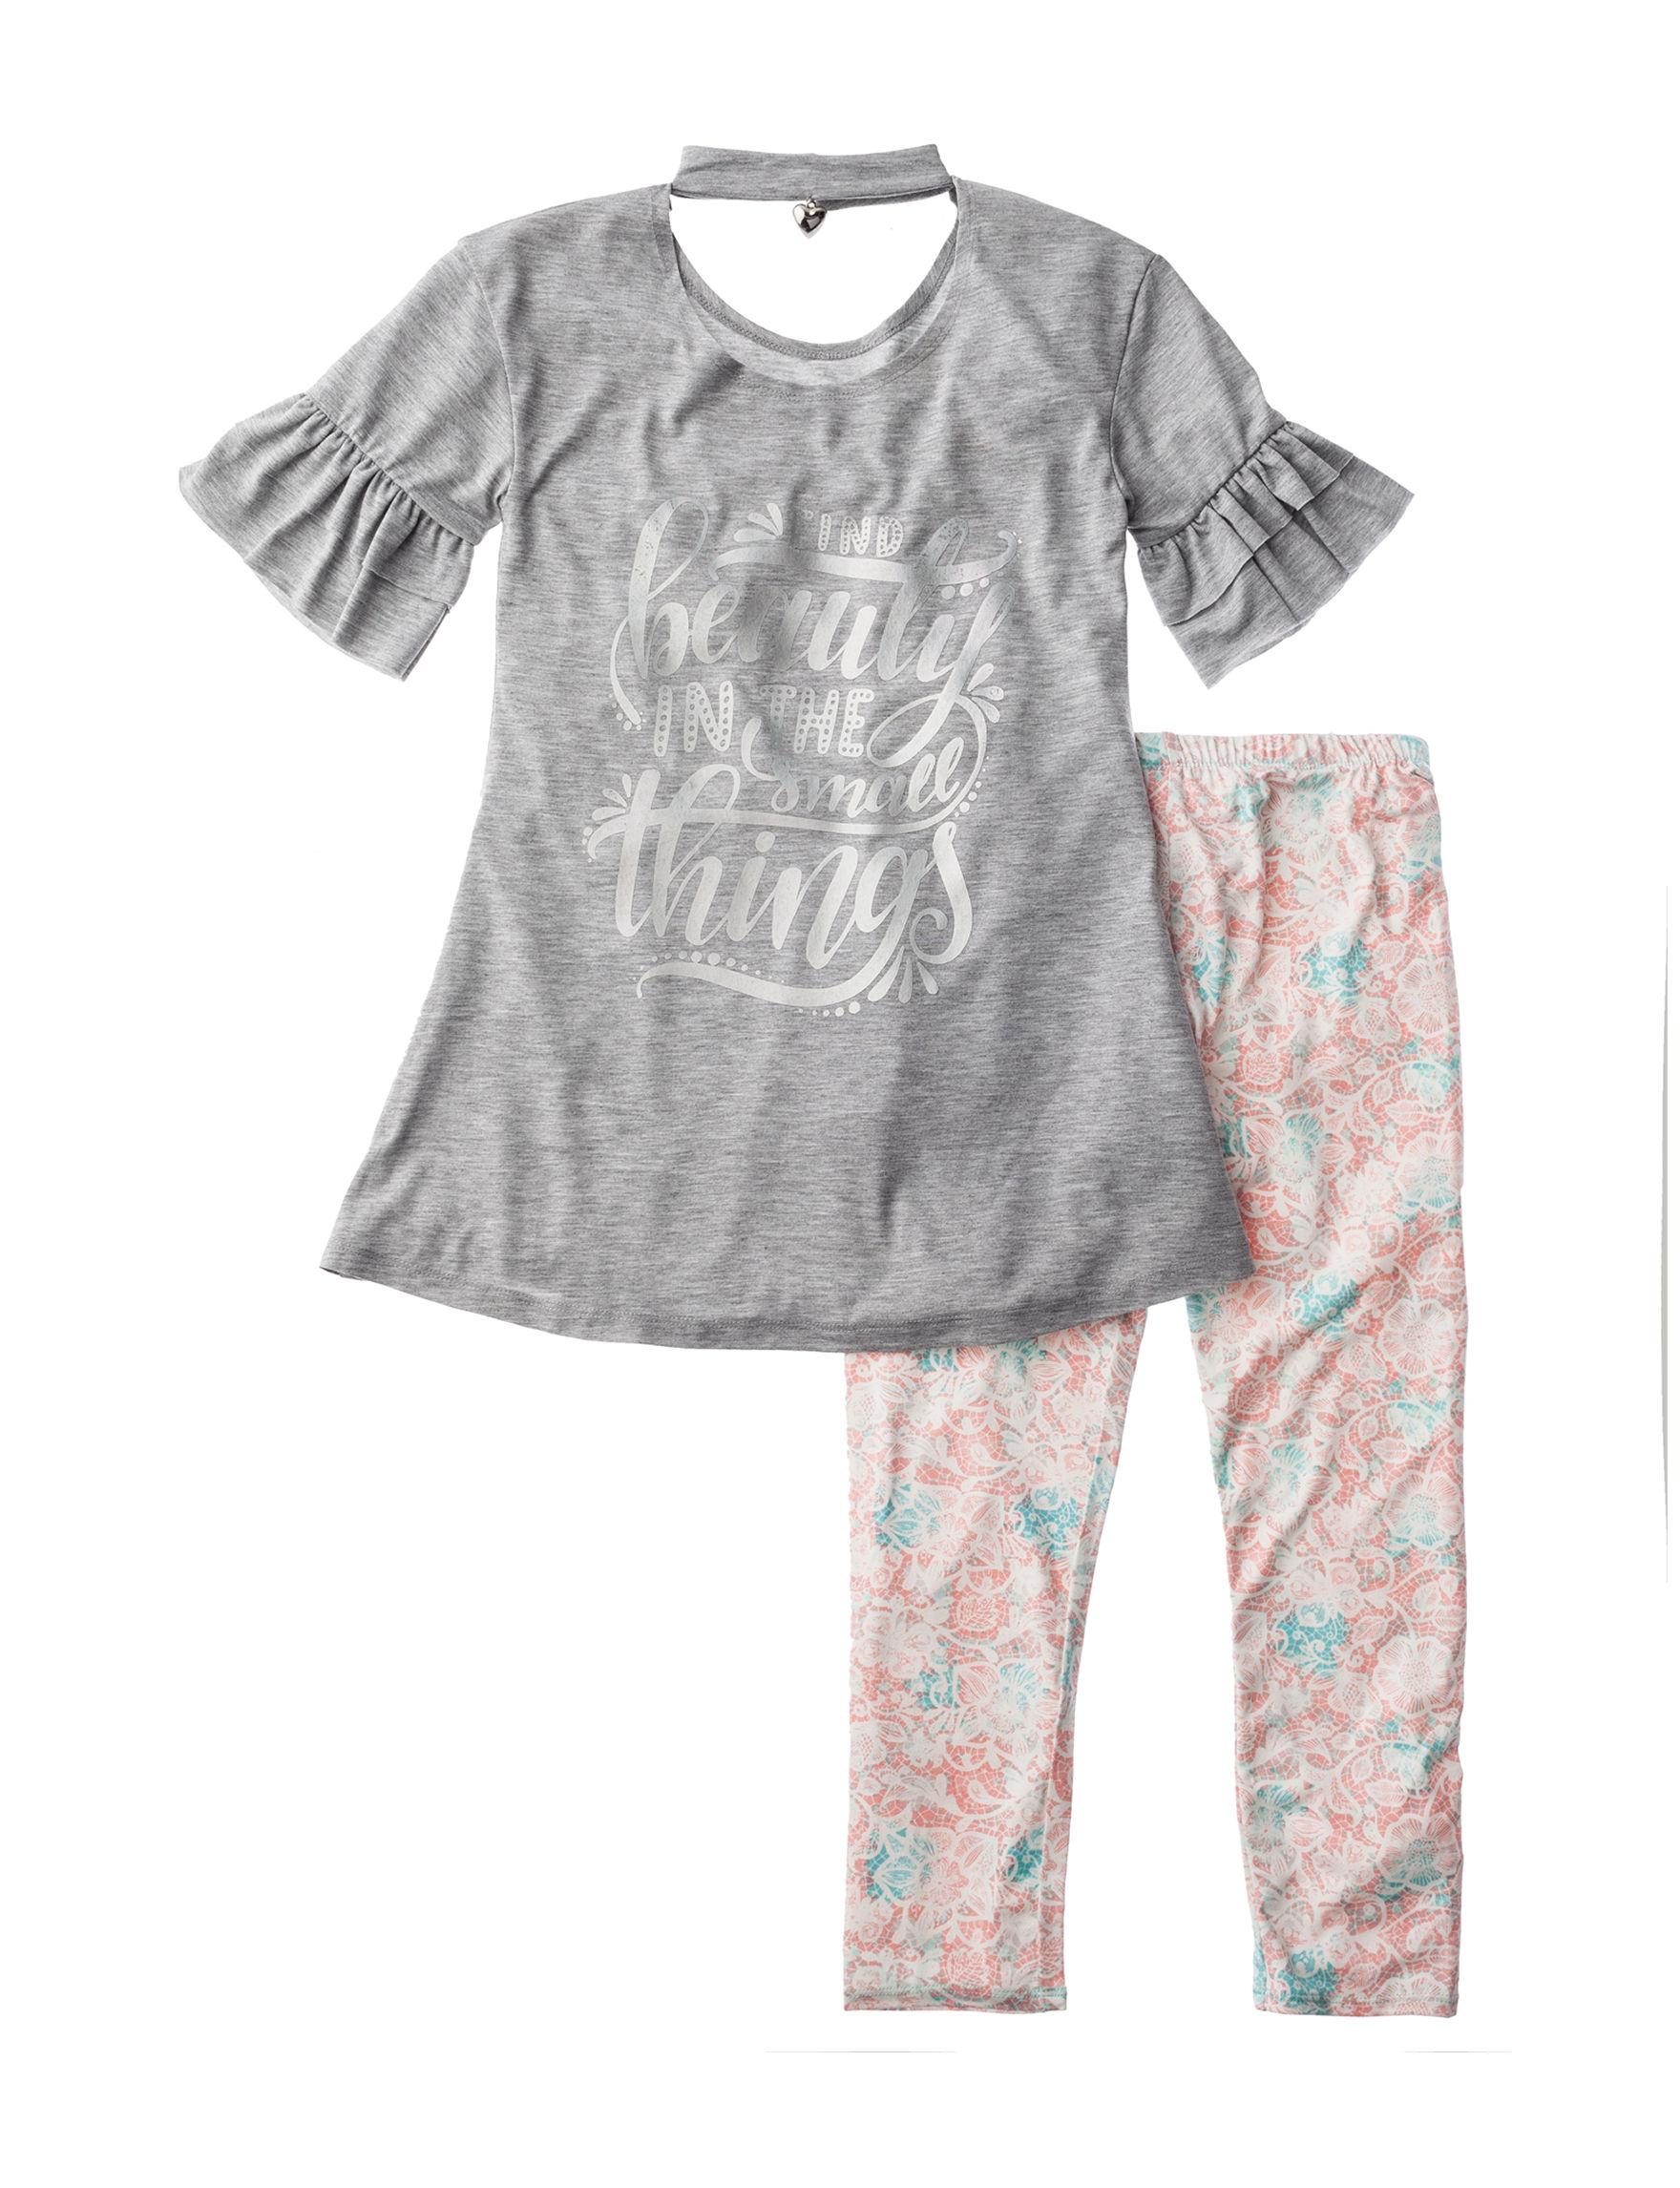 One Step Up Grey / Pink Leggings